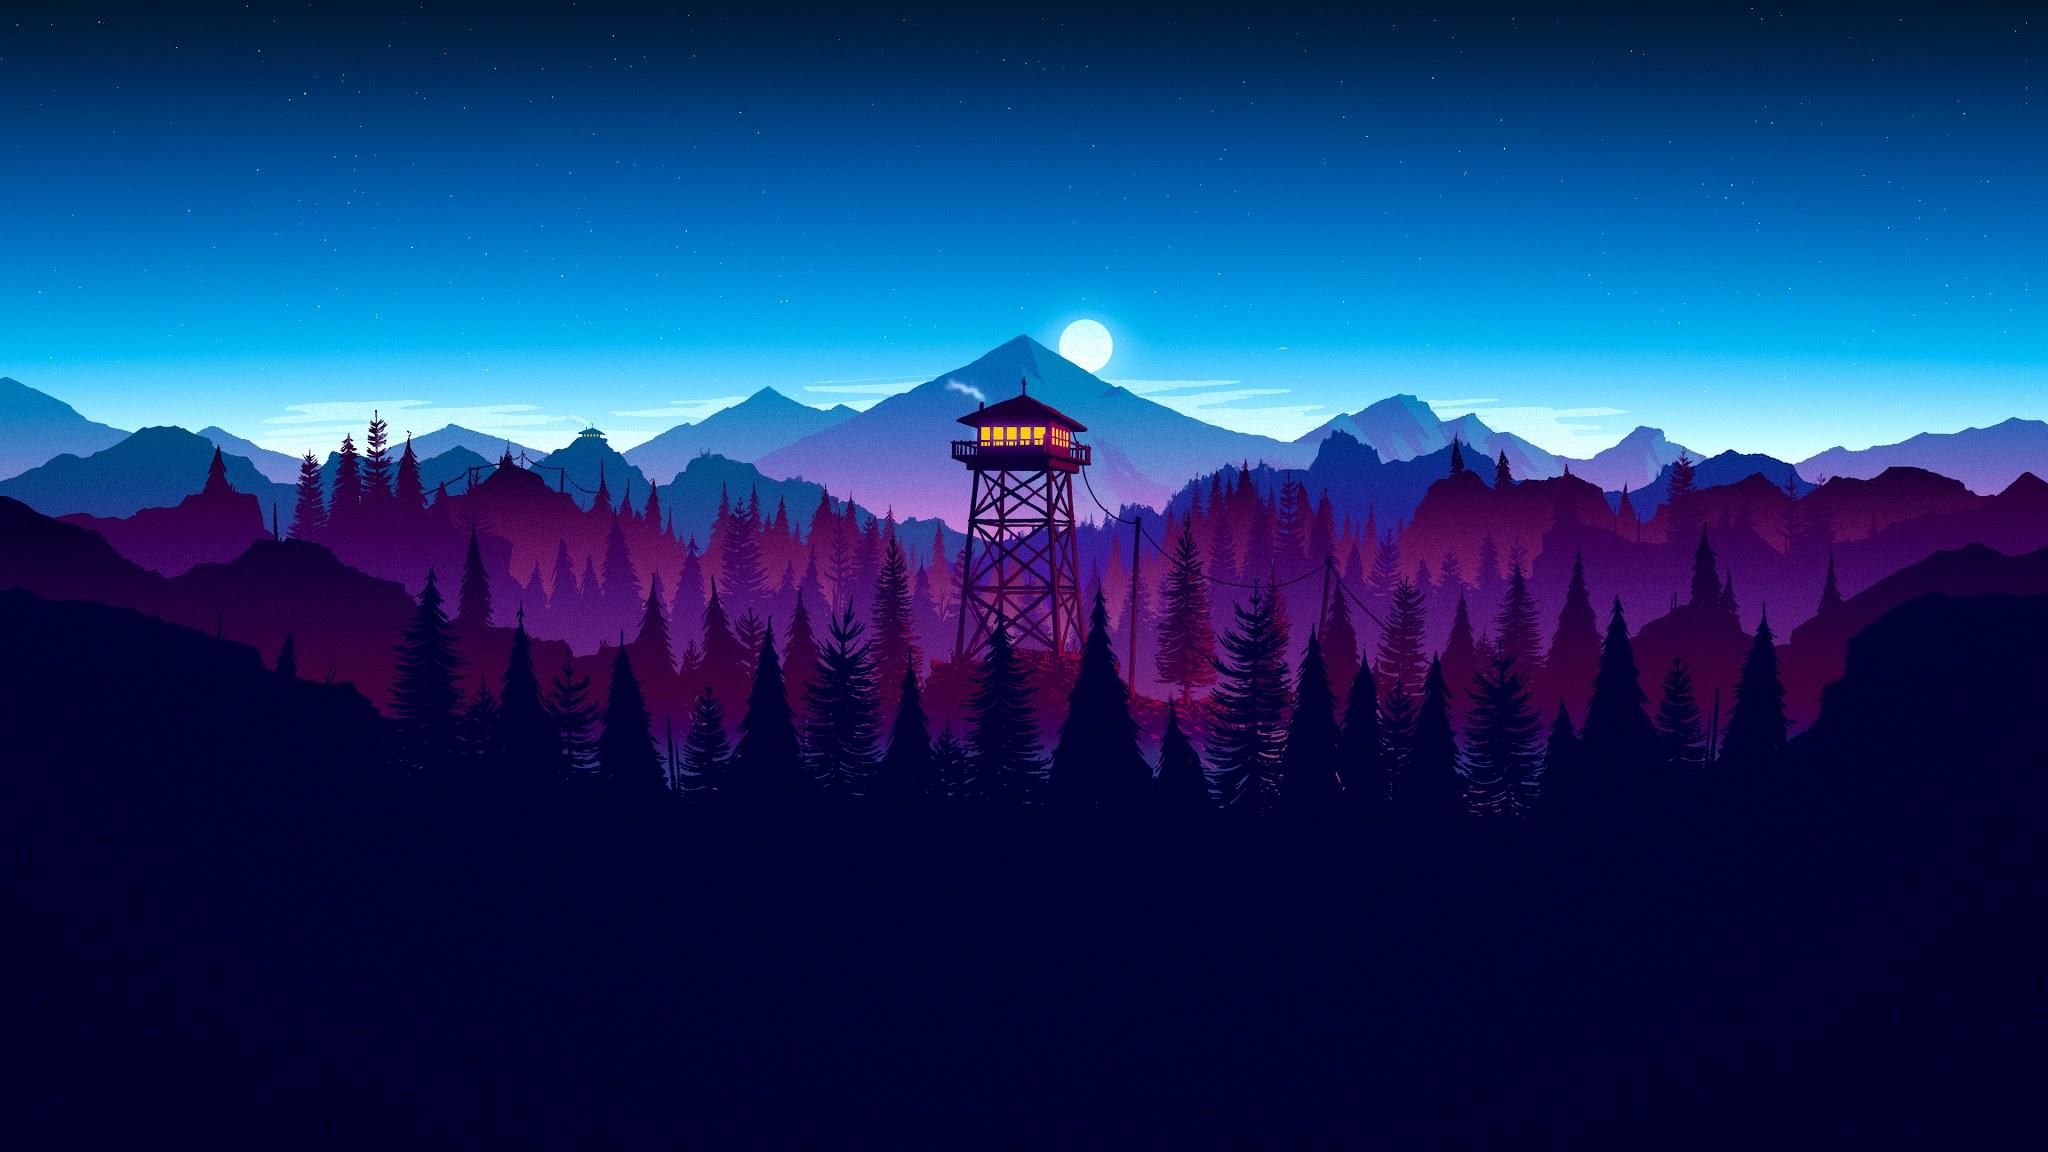 Simple Wallpaper Mountain Google - %2540OsumWalls%2BFireWatch%2BWalls%2B%25282%2529  Best Photo Reference_33923.jpg